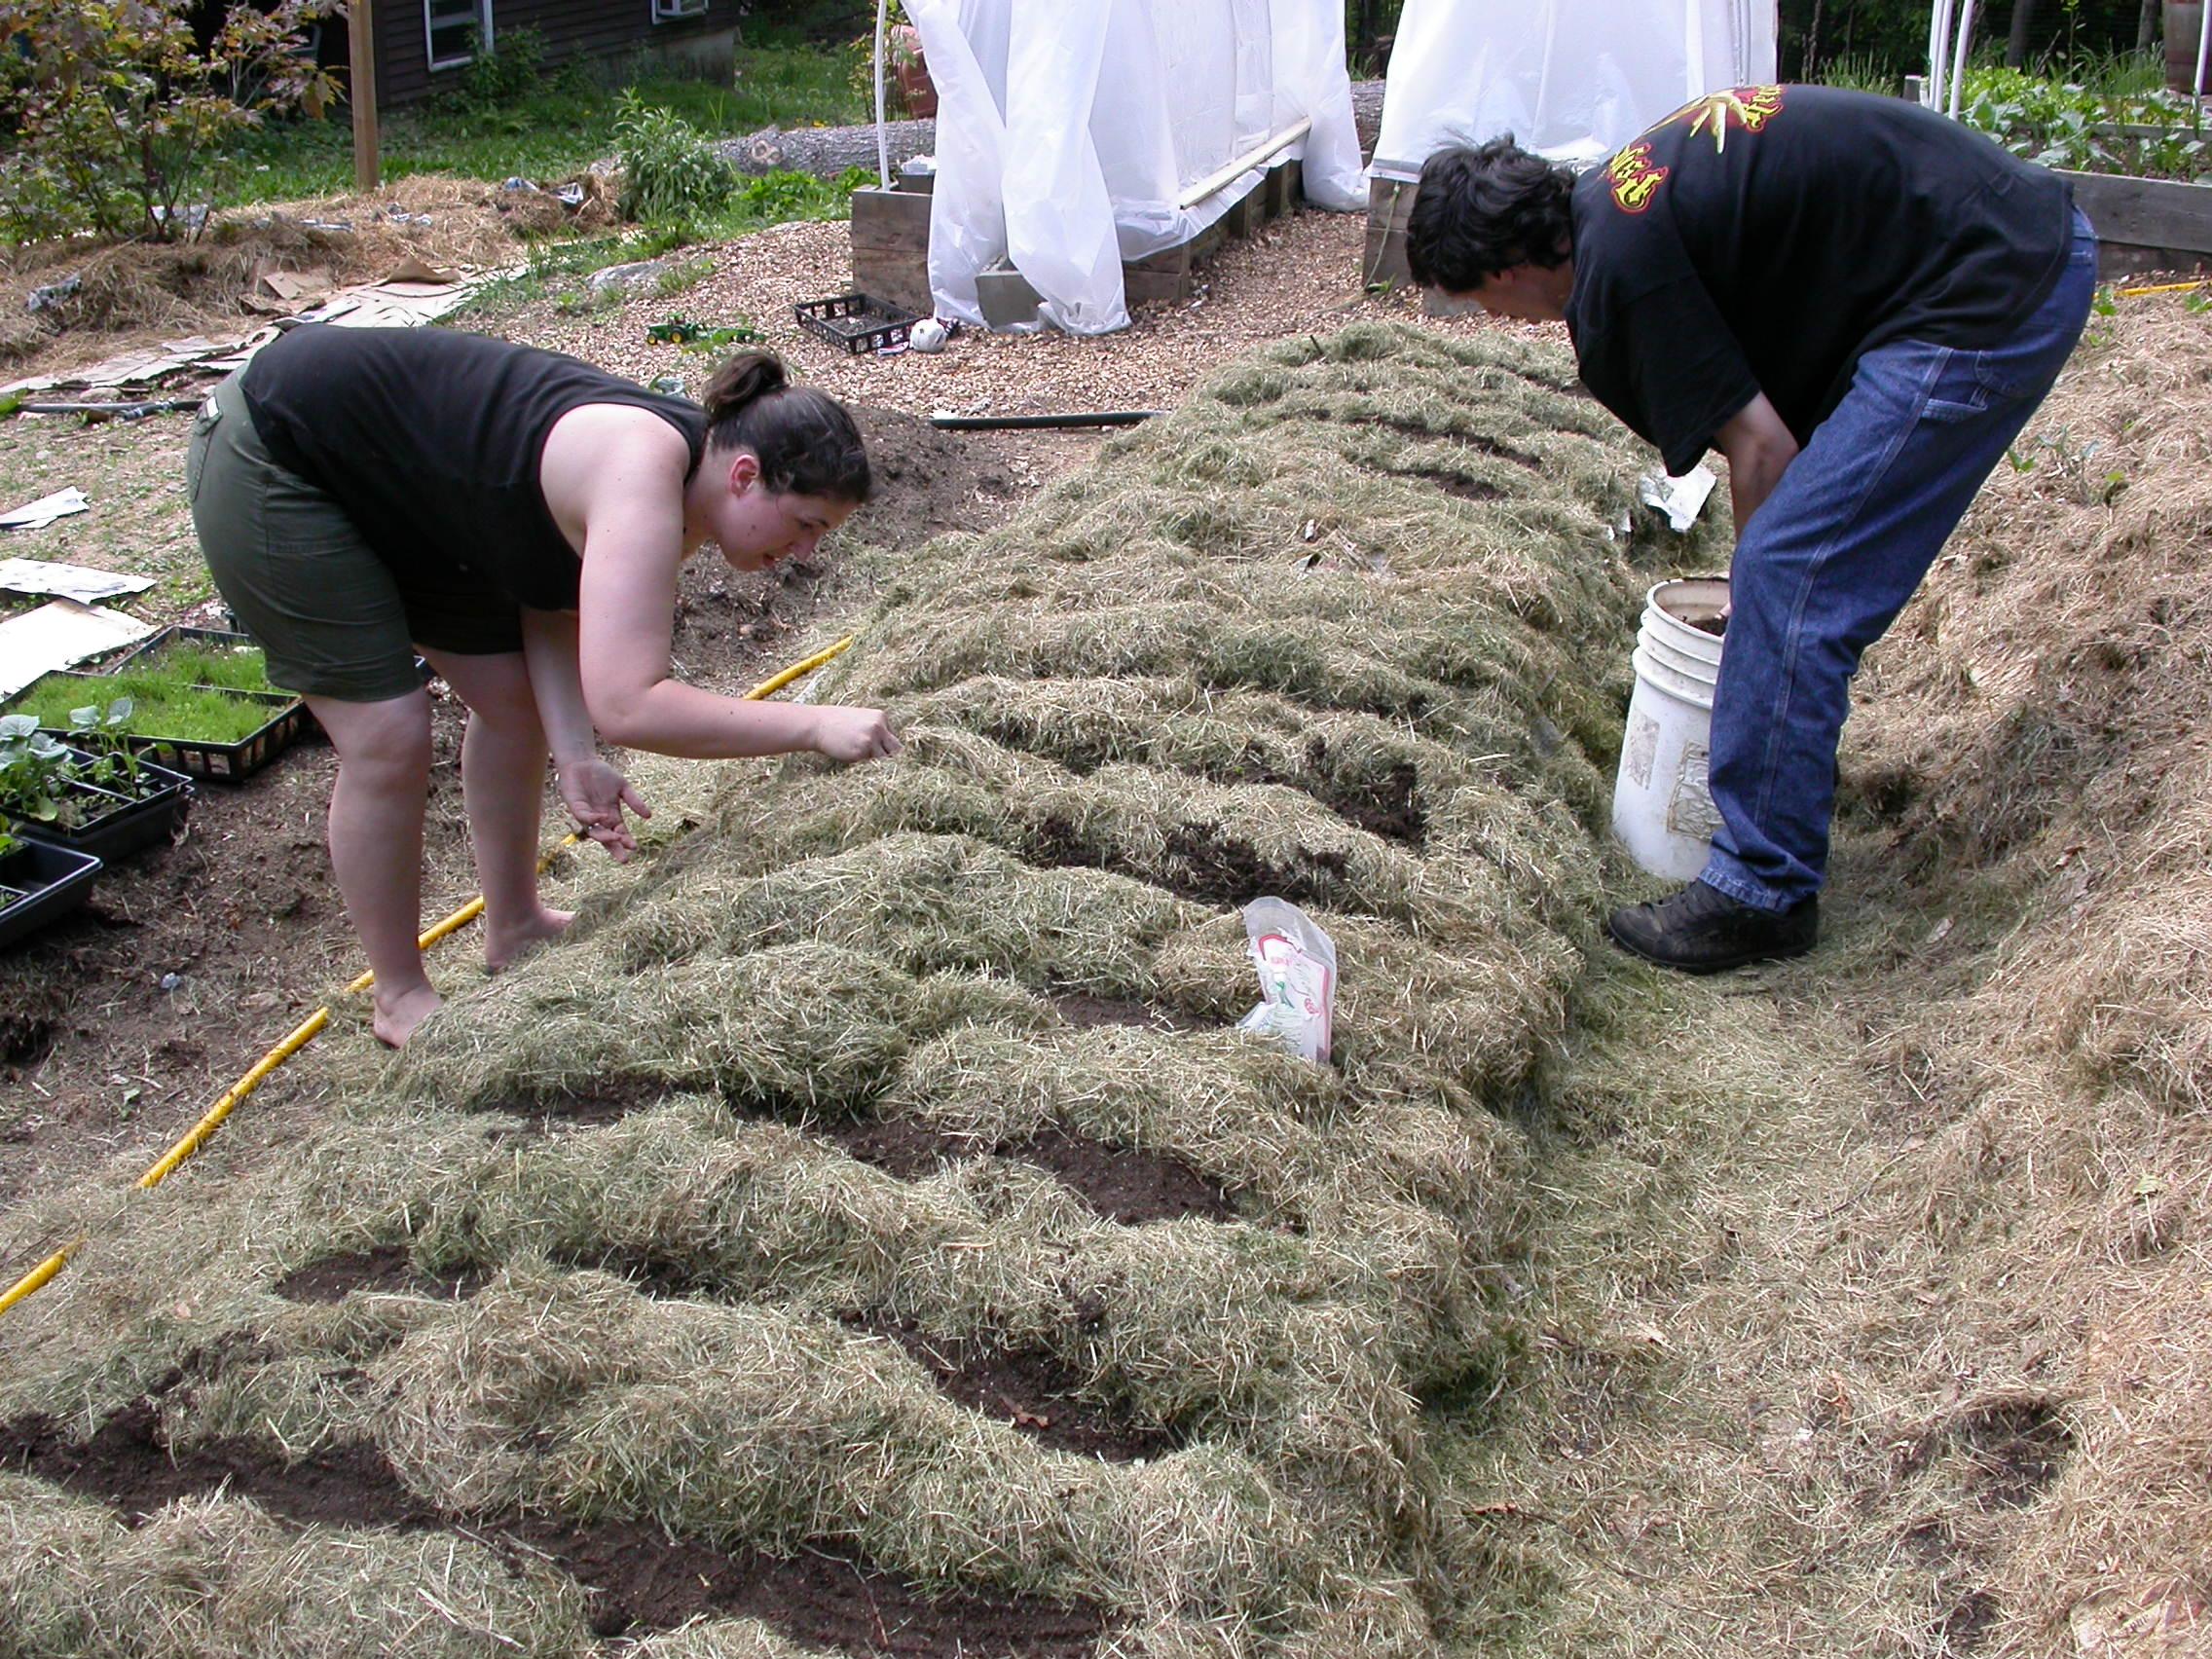 Soil No Till Lasagna Composting in Place, Sheet Mulching